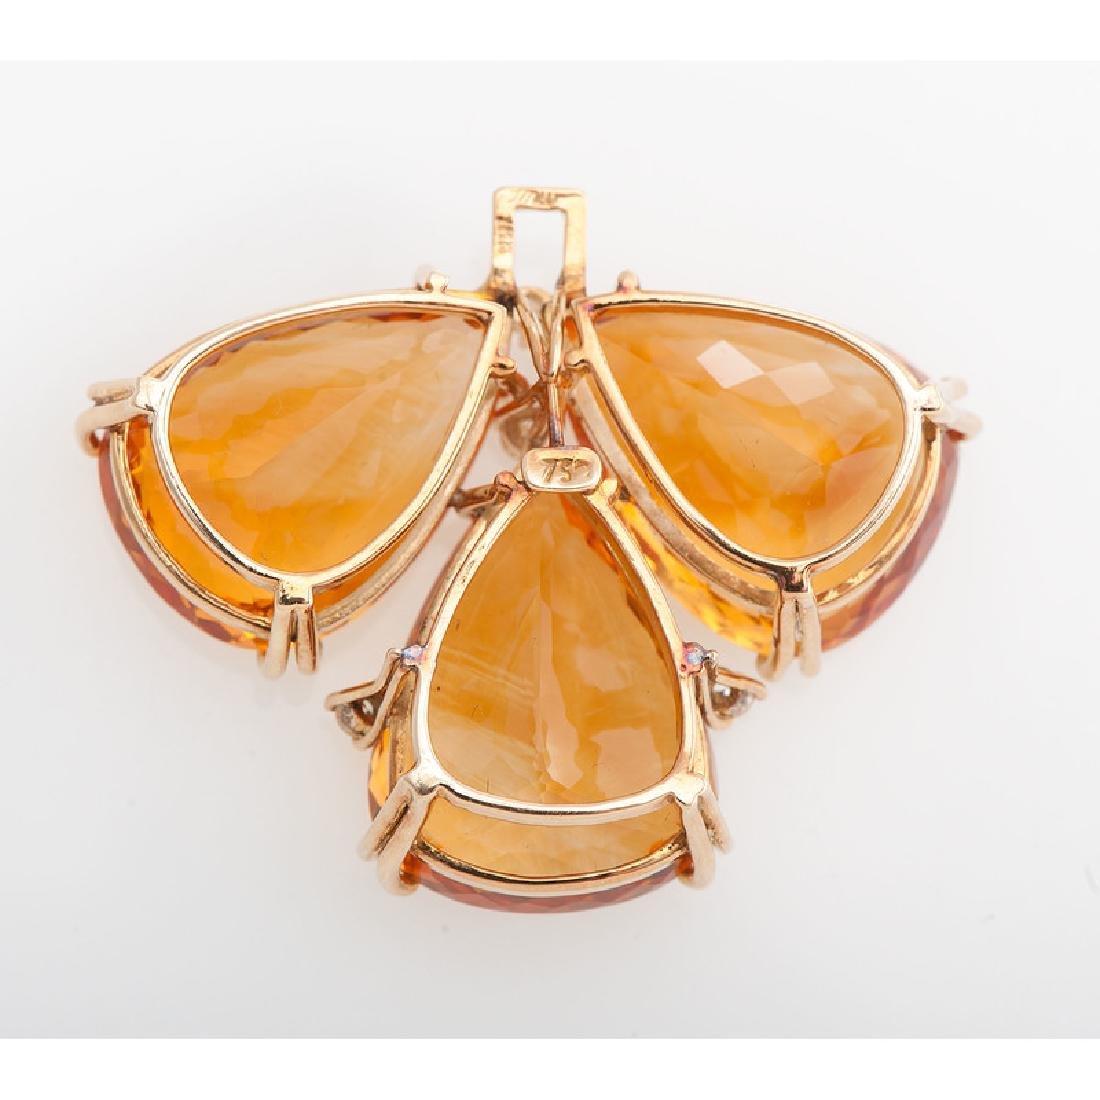 18 Karat Yellow Gold Pendant - 2